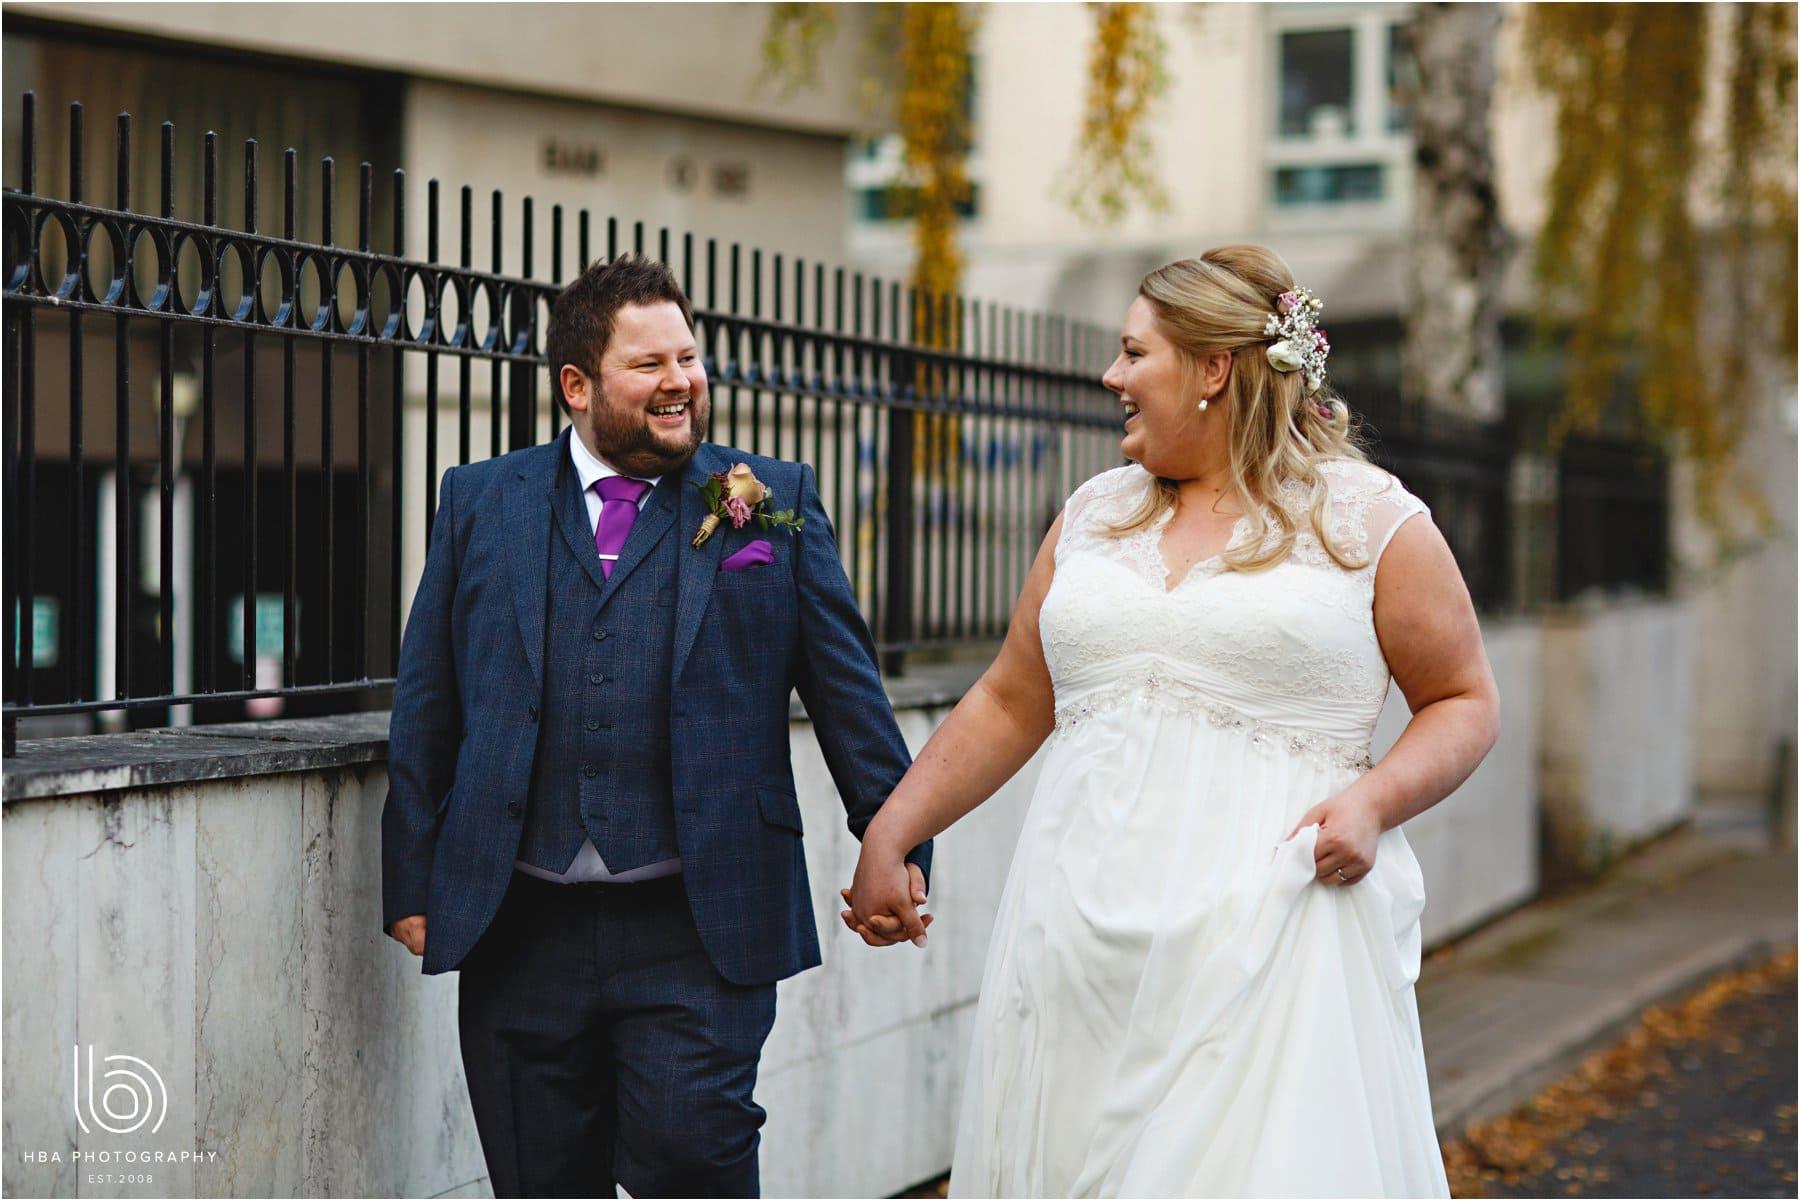 The bride & groom walking along